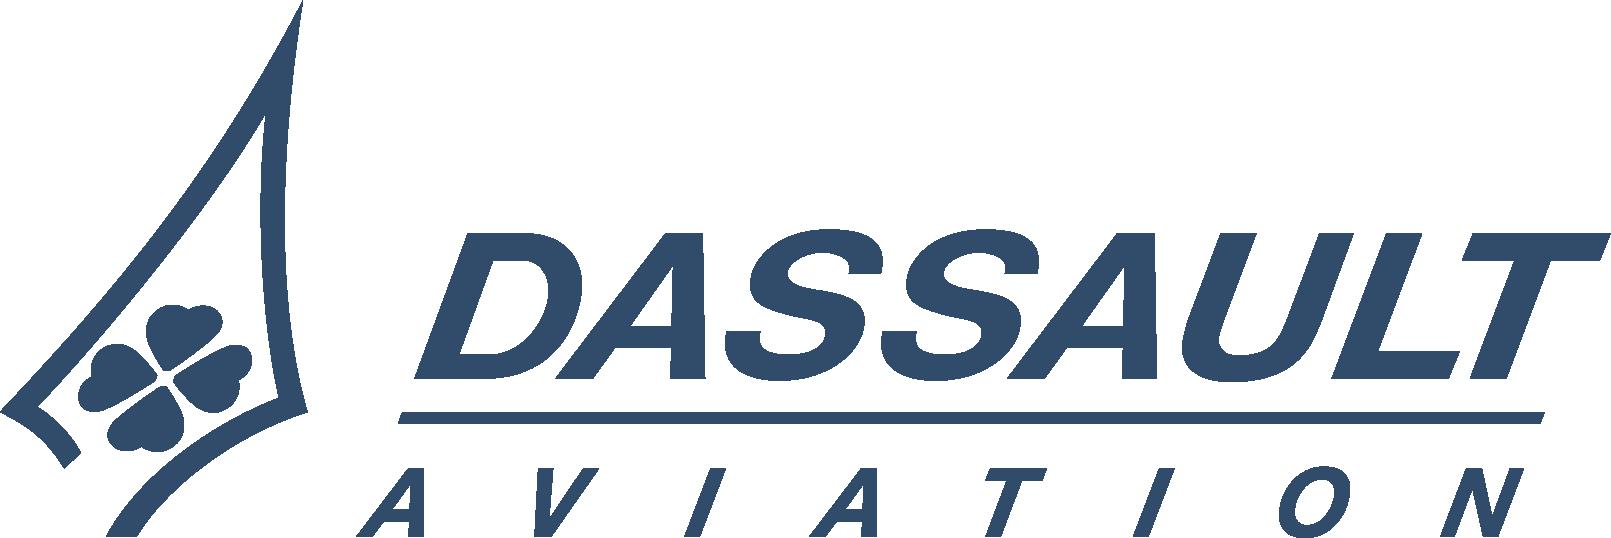 Dassault Aviation Logo png